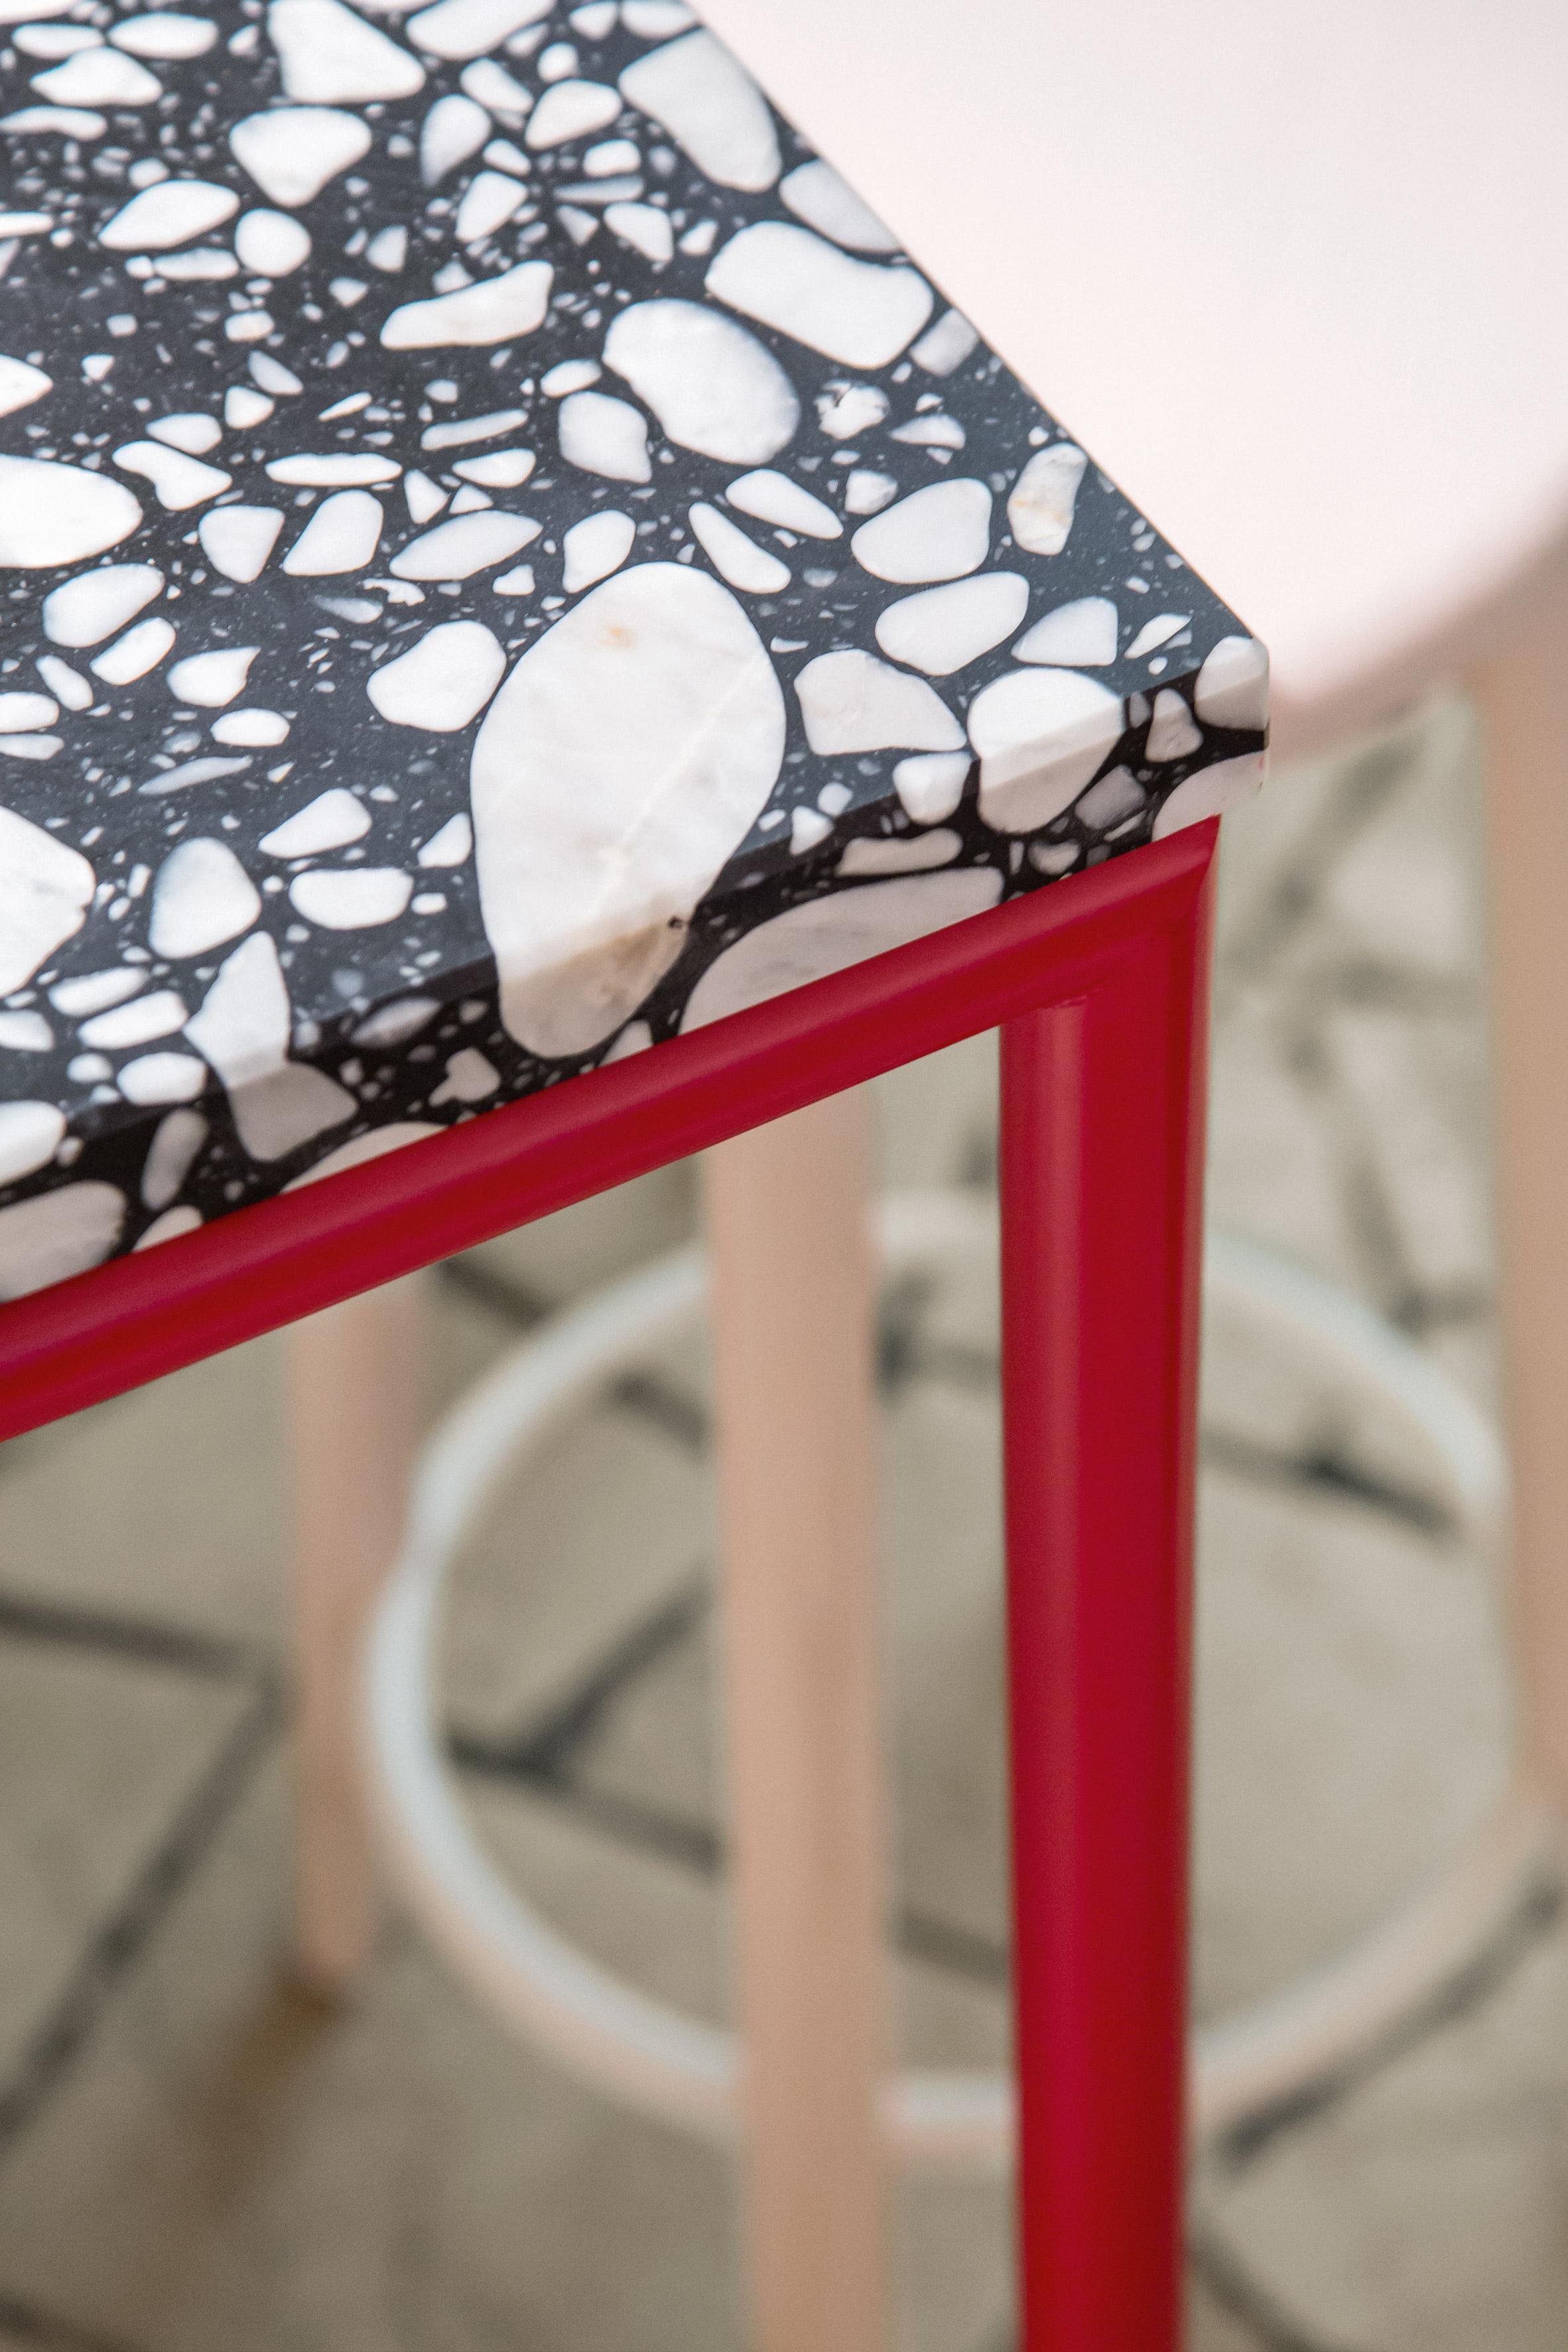 Ester Bruzkus Architekten designs Hockney-inspired restaurant in Berlin